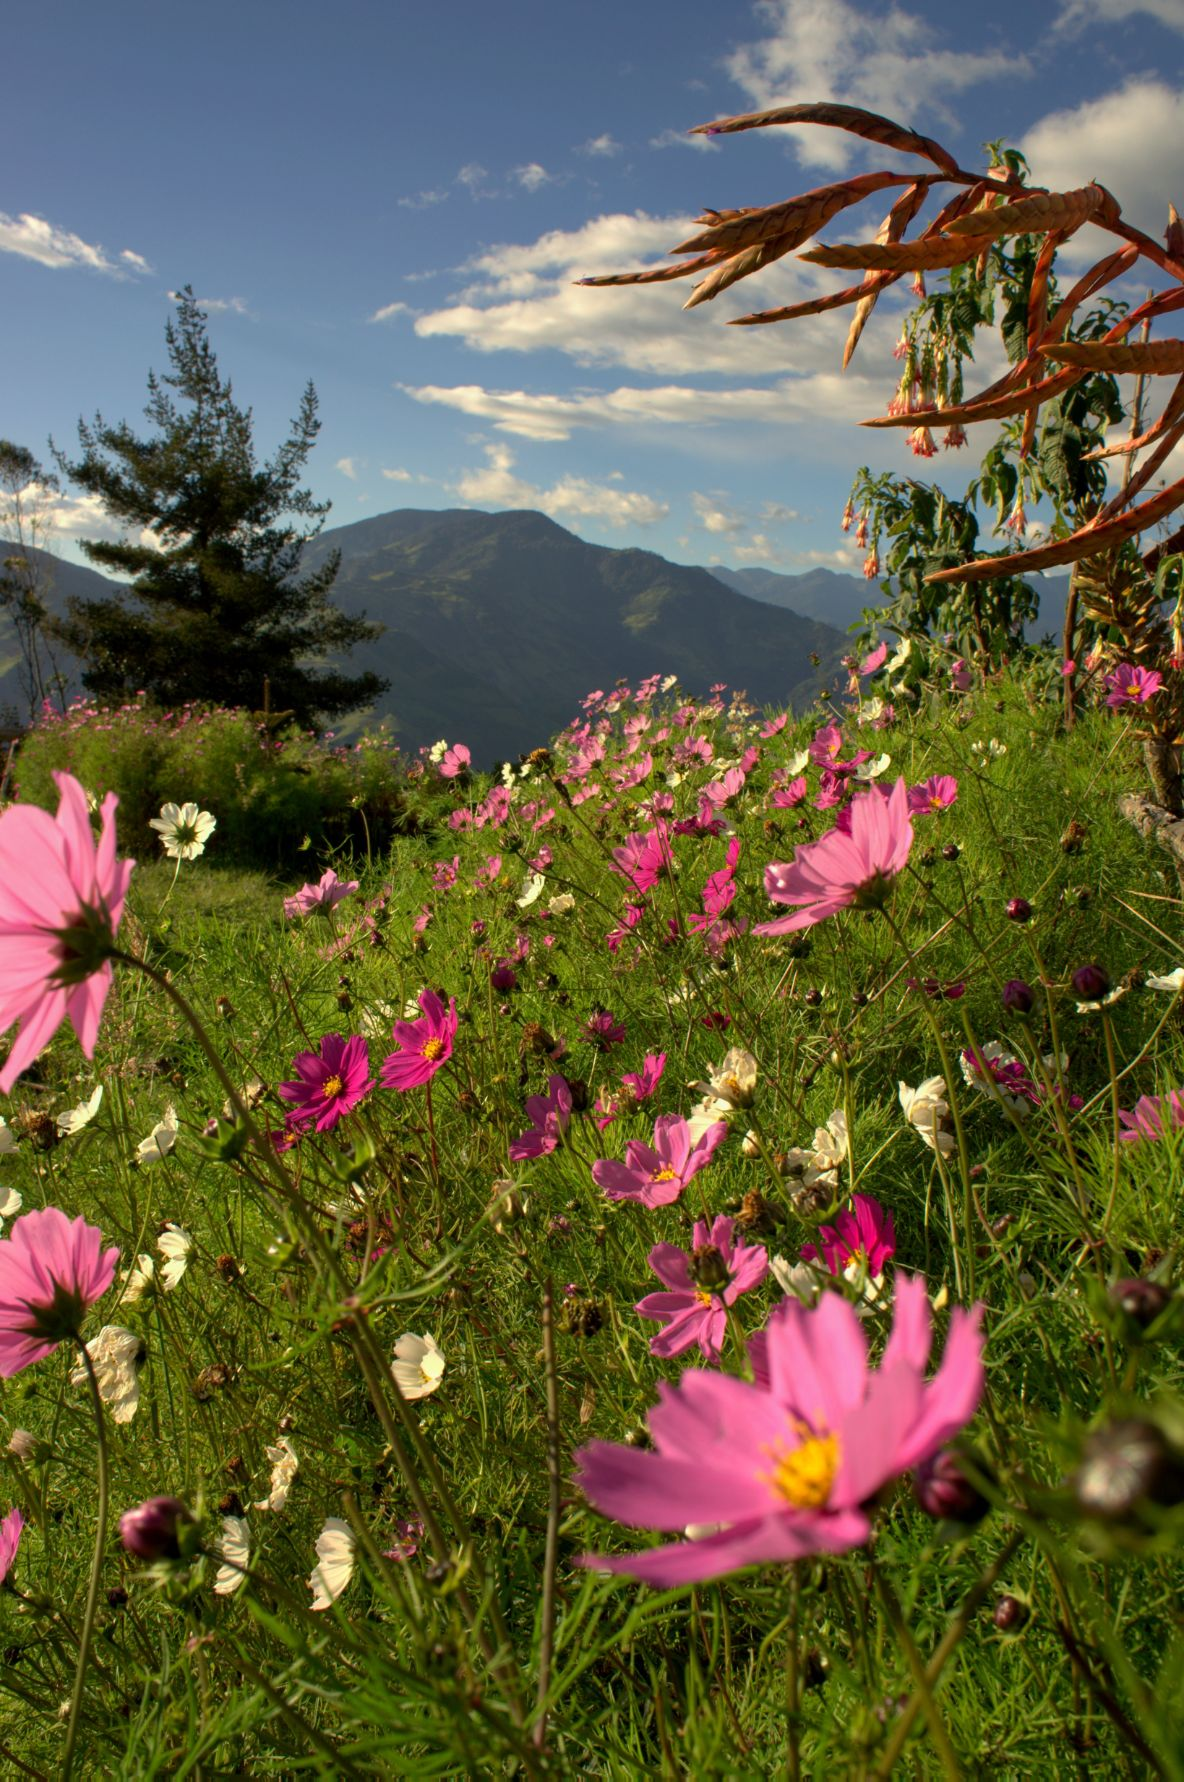 Mountain and flowering field in Banos, Ecuador